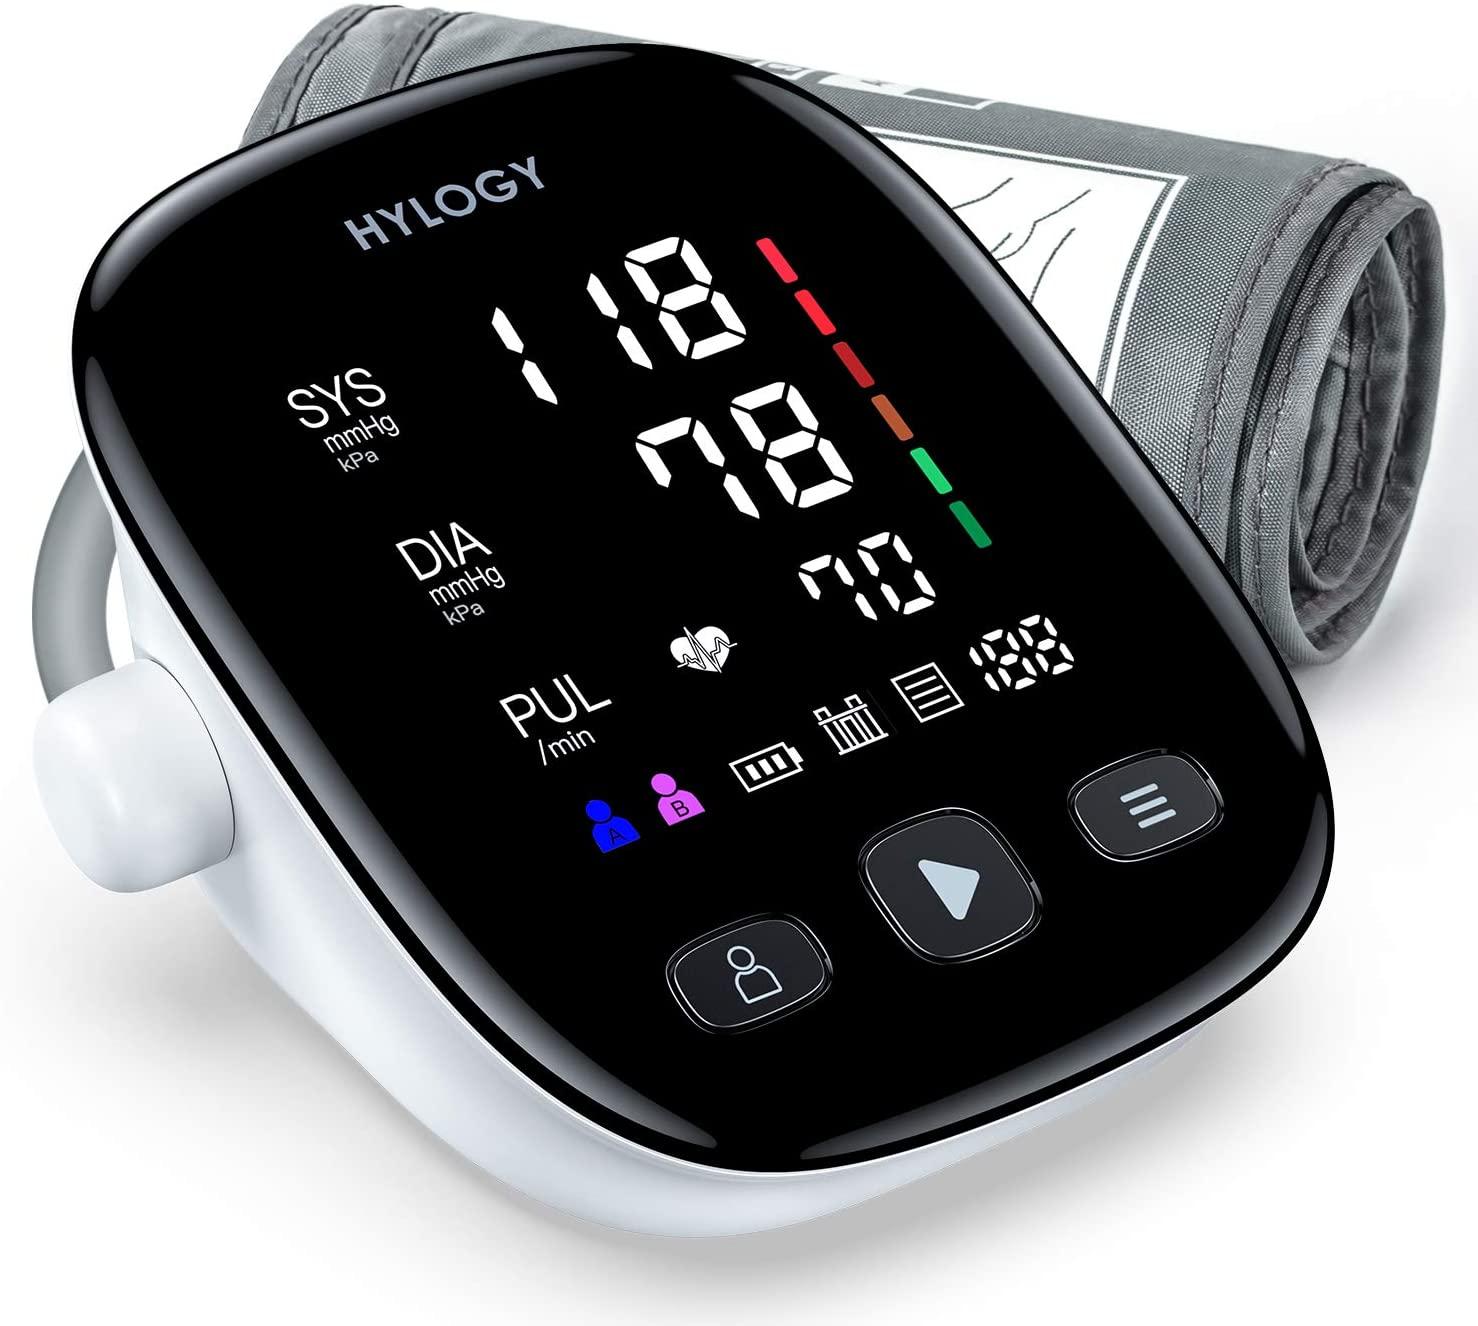 tensiometro-digital-hylogy-md-h131.jpg